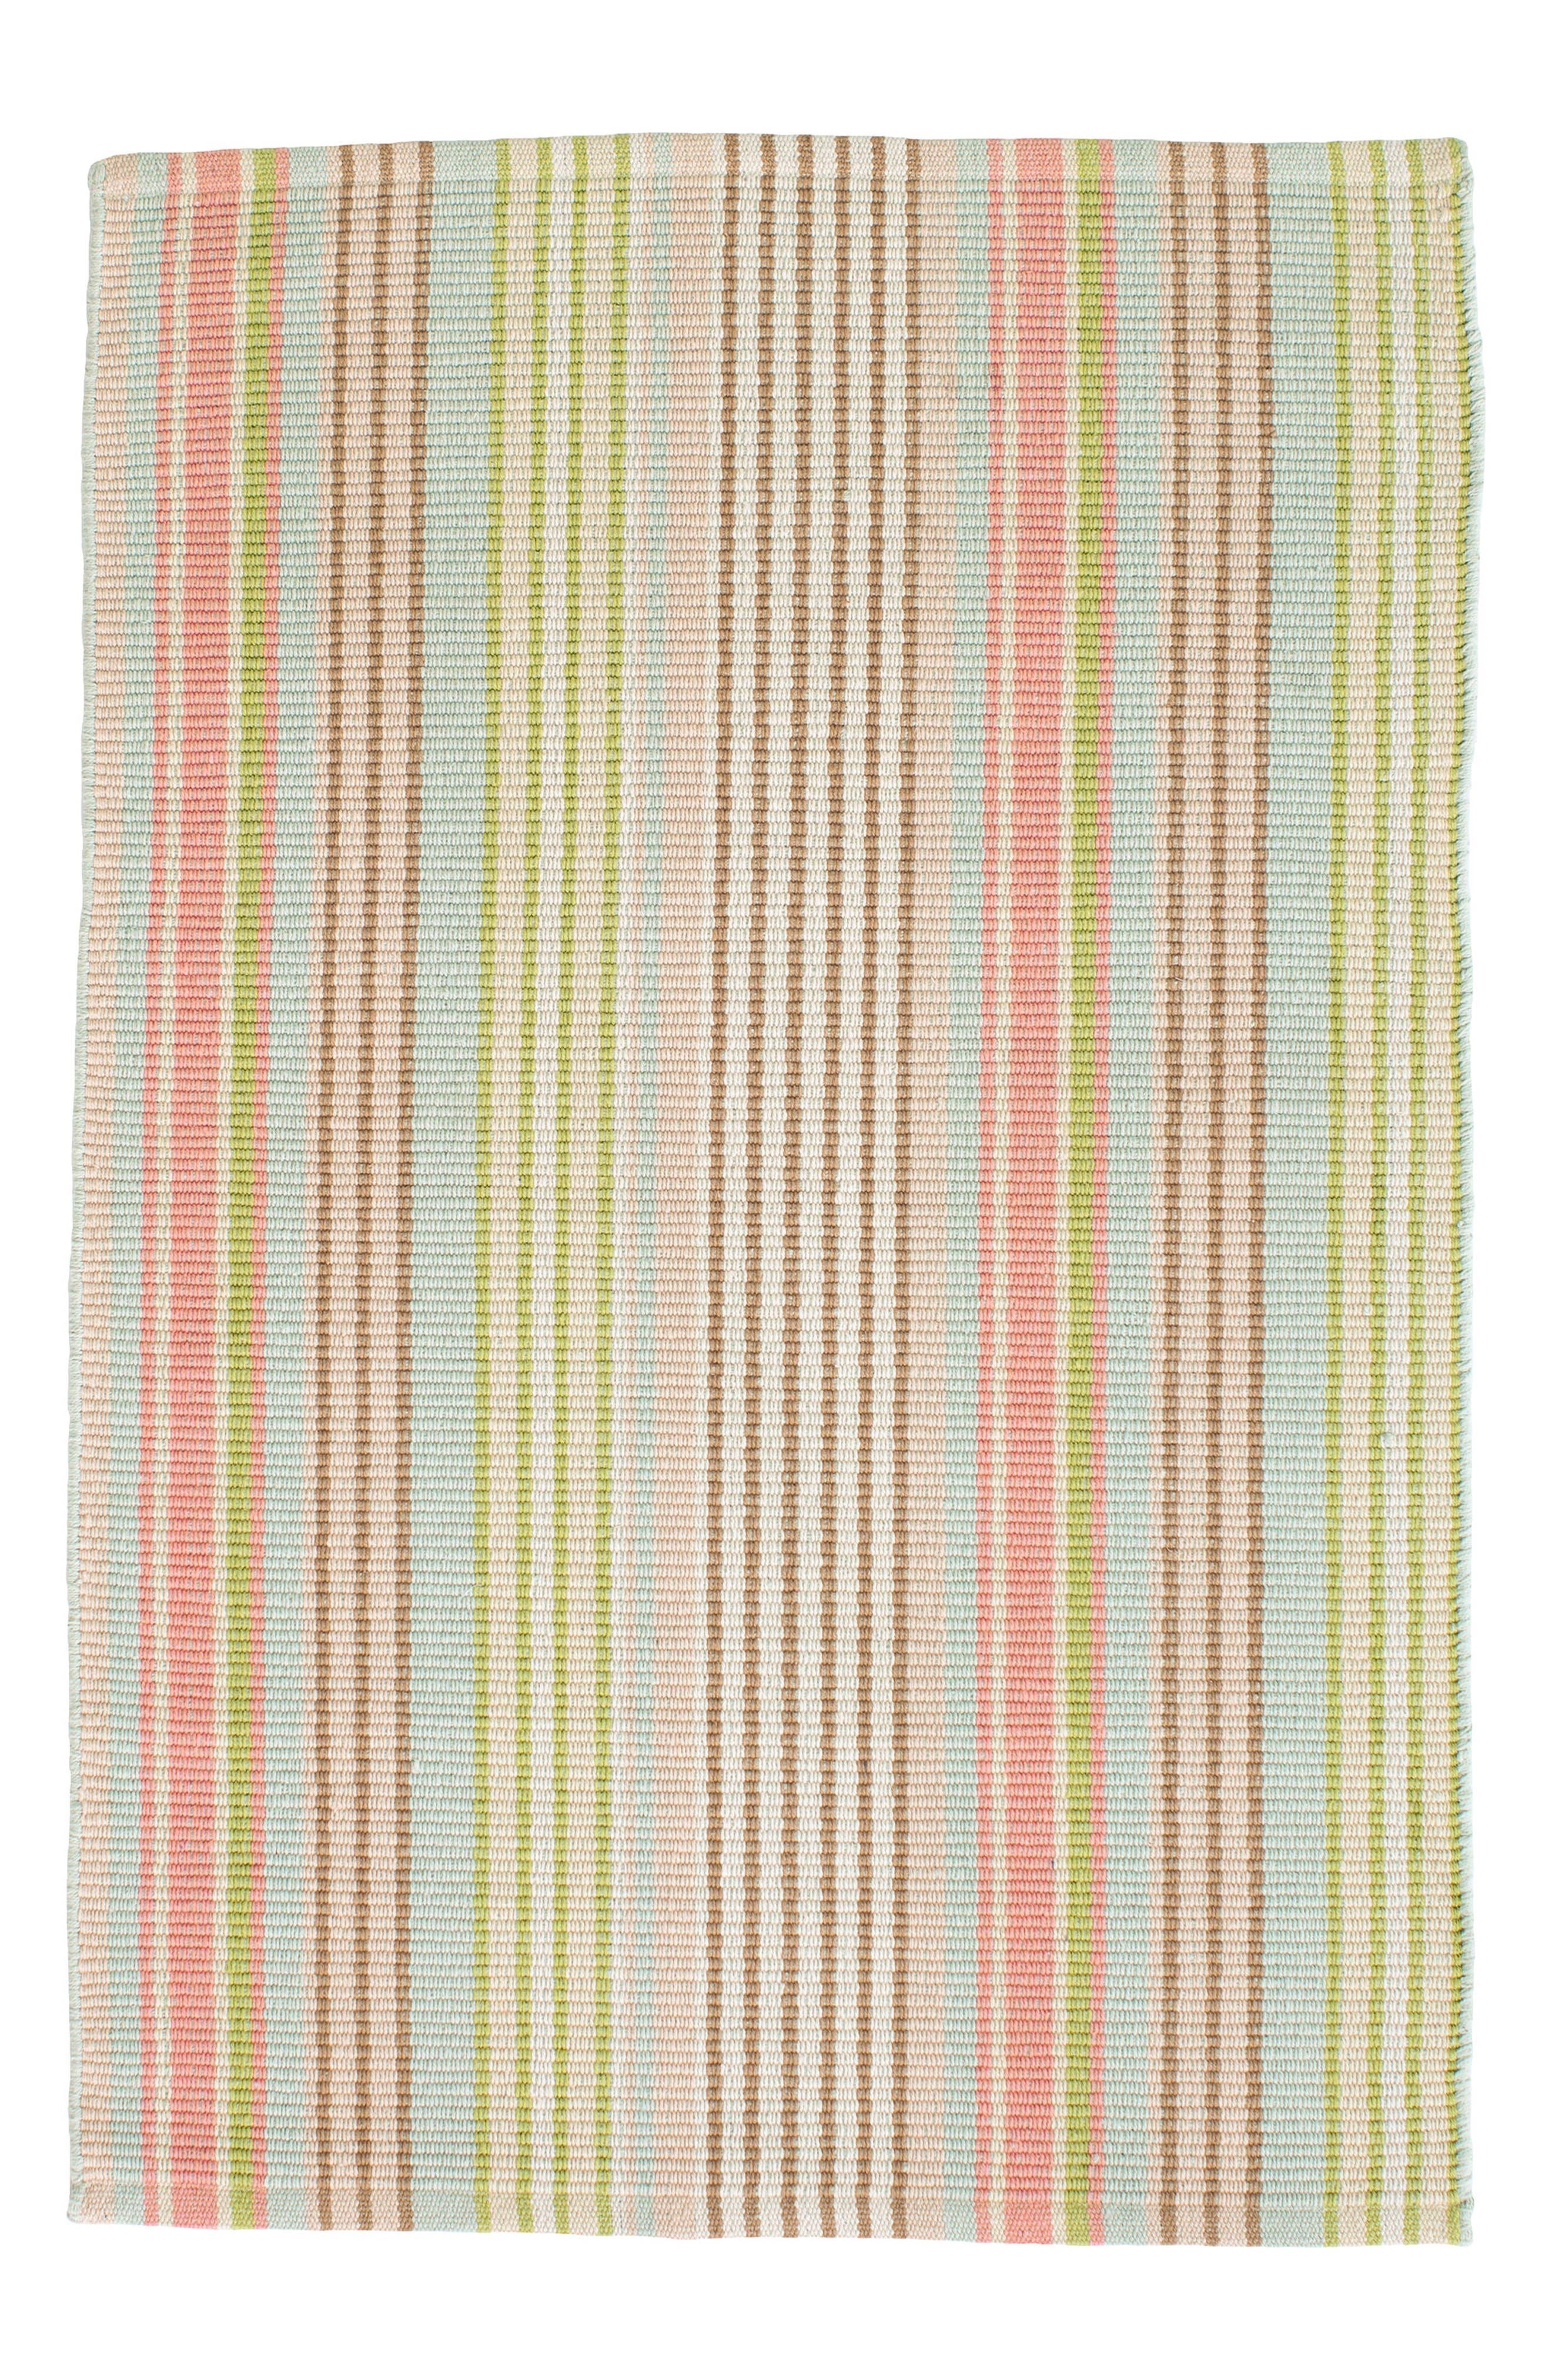 Ana Ticking Woven Rug,                             Main thumbnail 1, color,                             AQUA